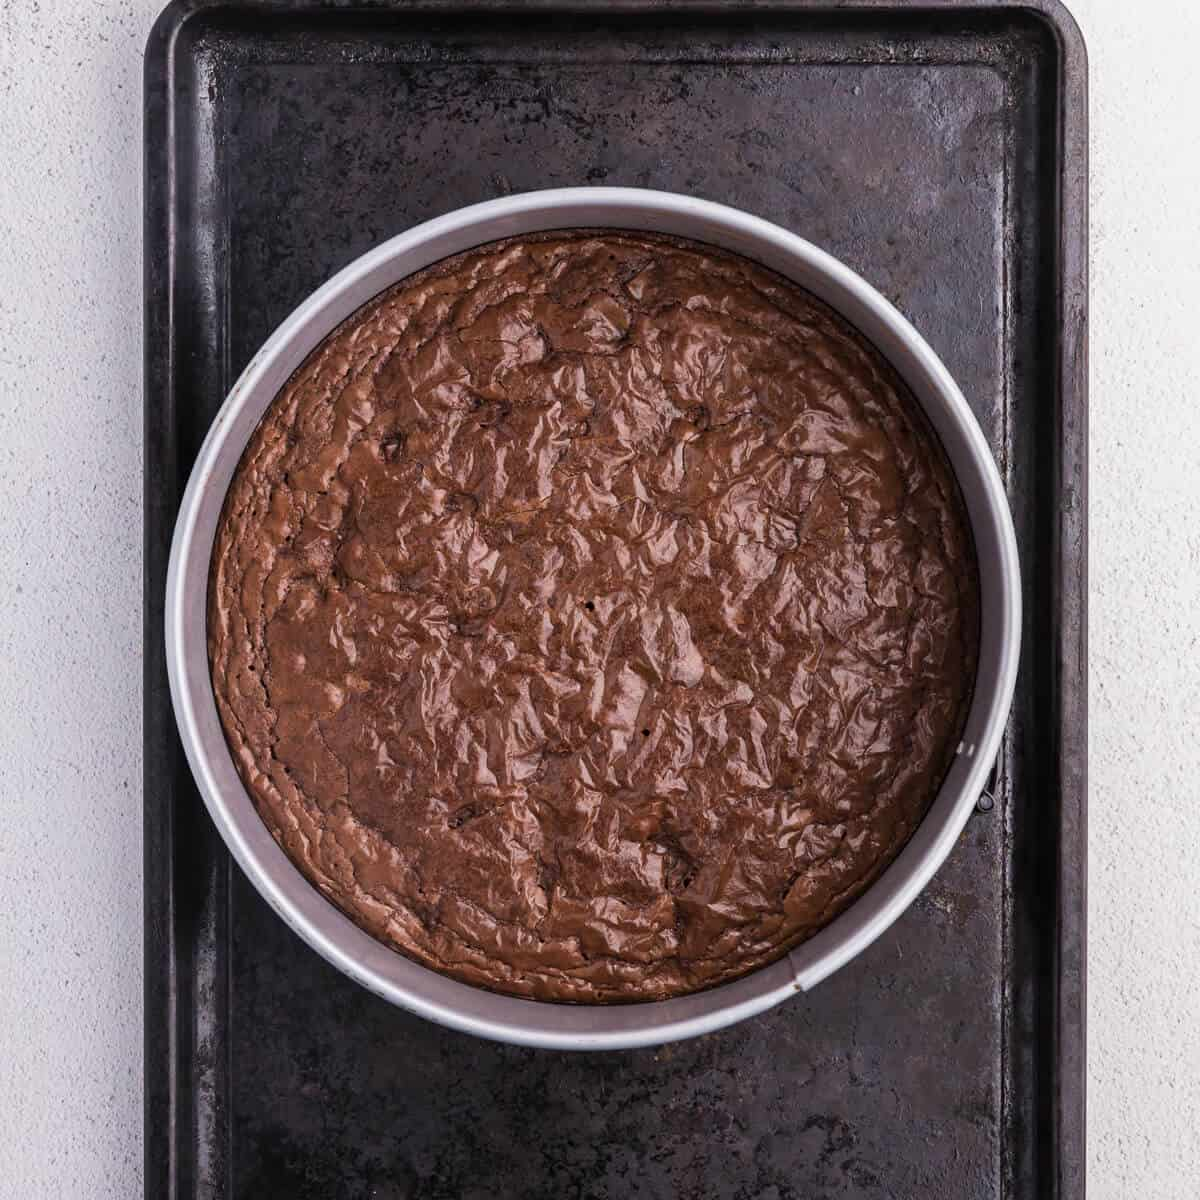 brownie bottom cheesecake baked